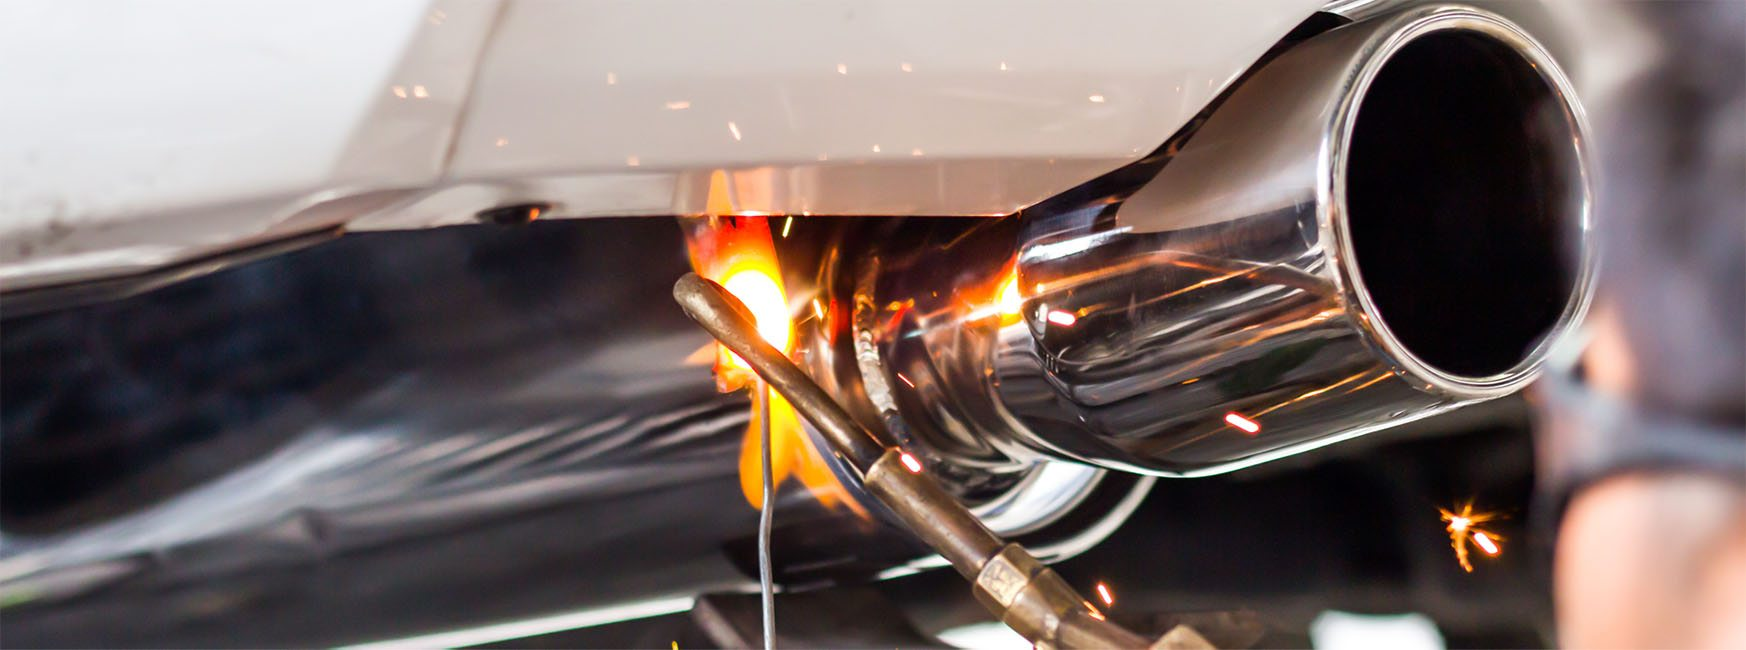 denver custom mufflers exhaust failed